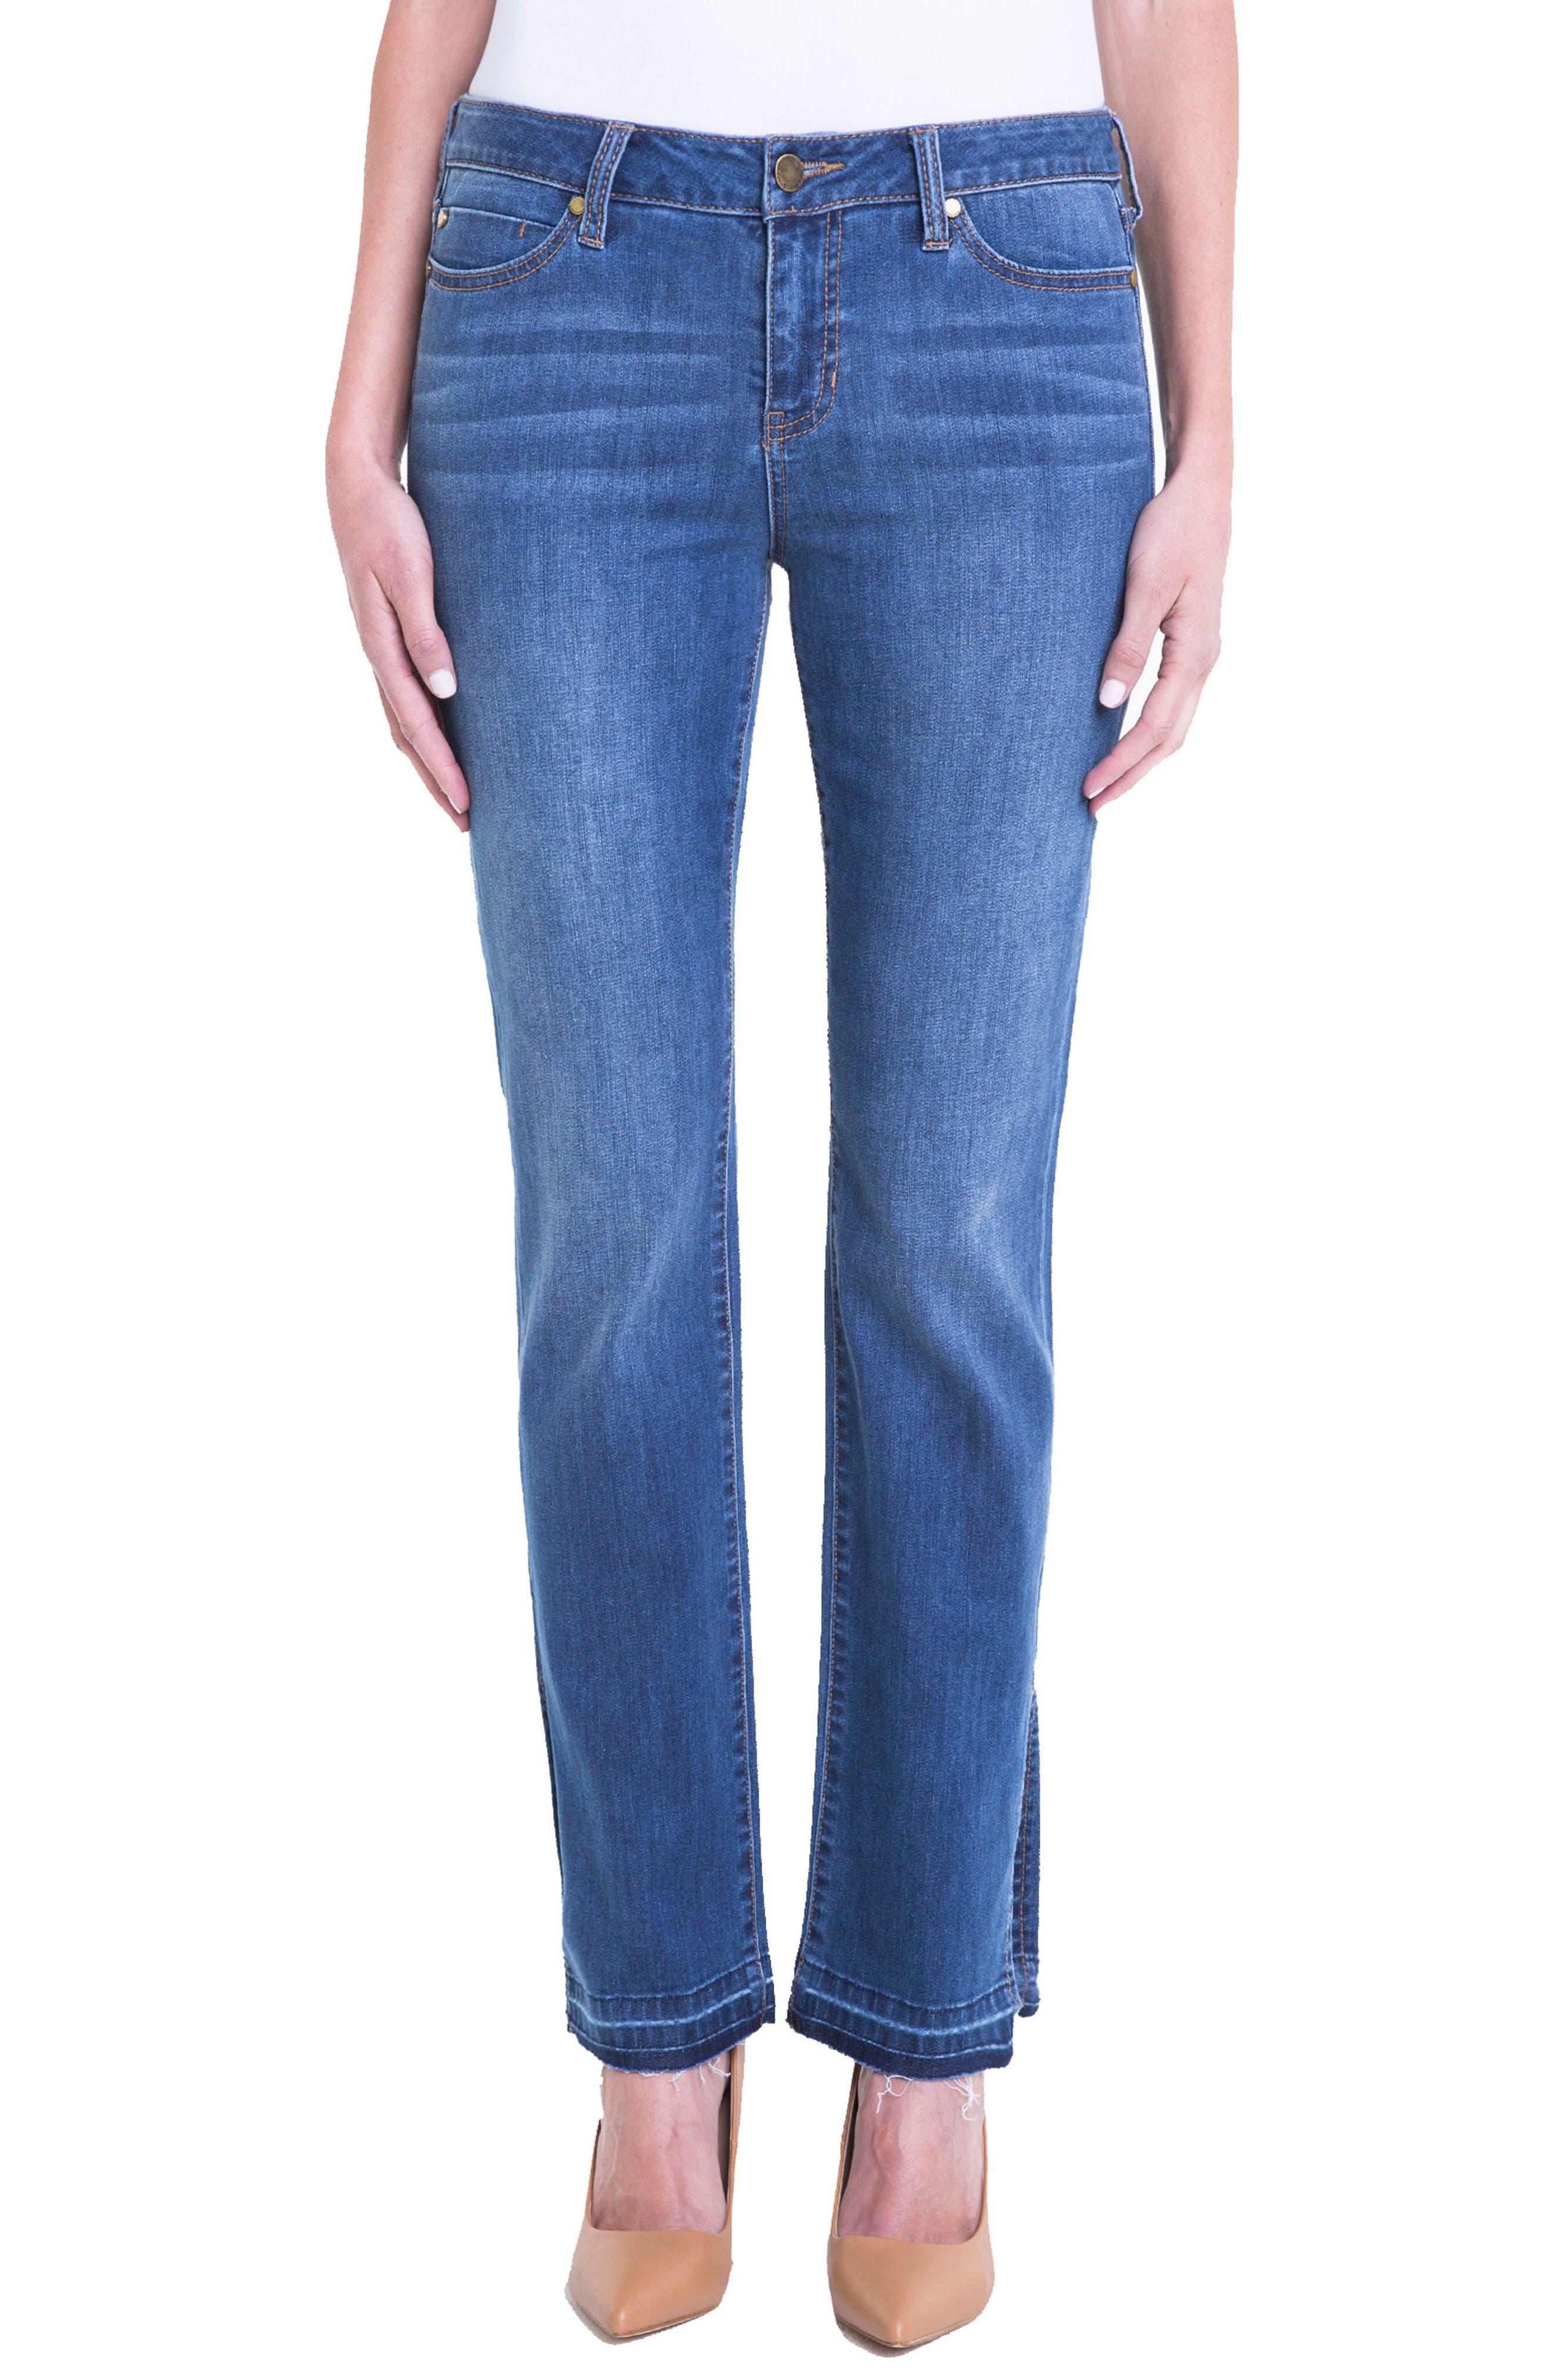 Liverpool Jeans Company Tabitha Release Hem Straight Leg Jeans (Montauck Mid)